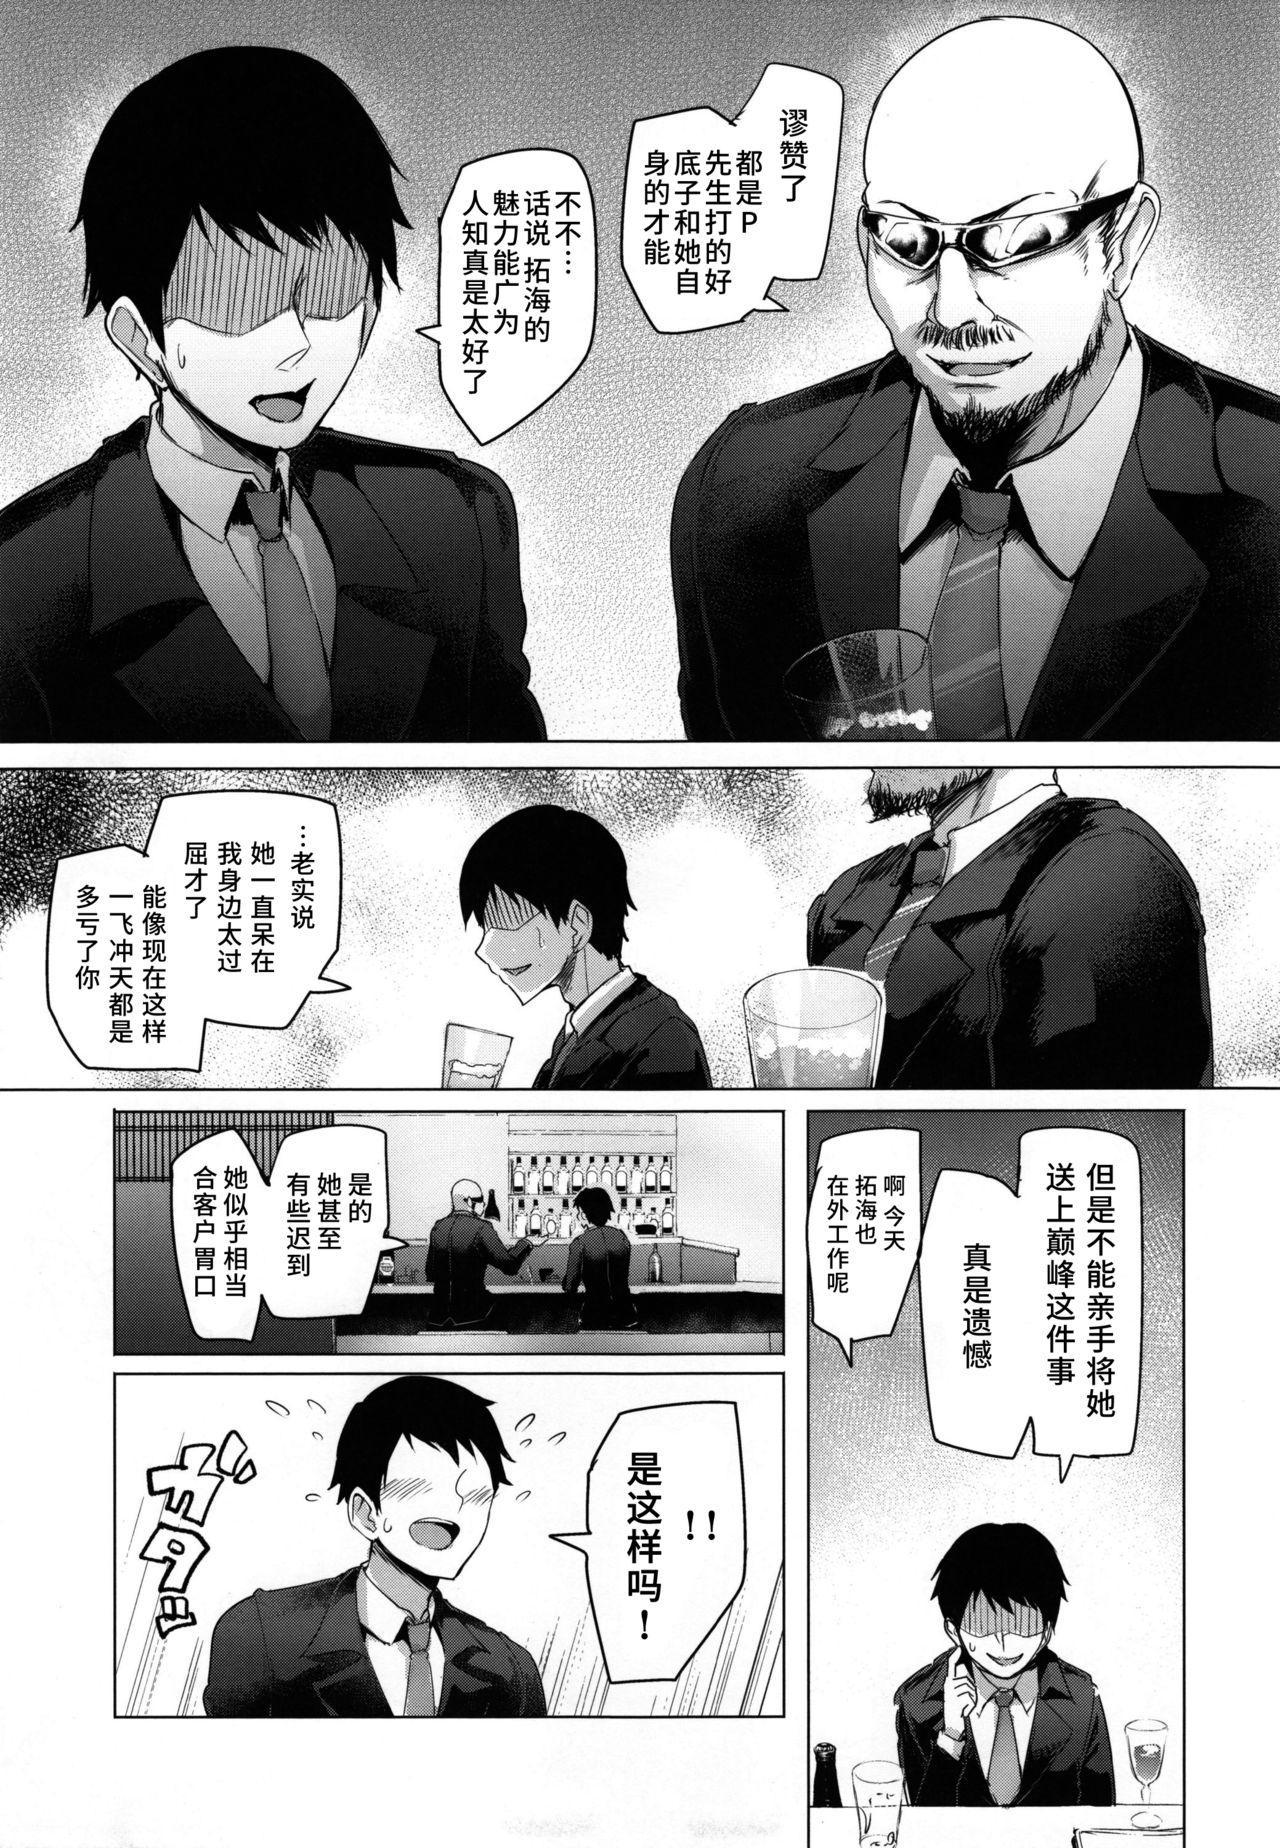 Shinai Max Mattanashi! 3 | Max Affection System! 3 22